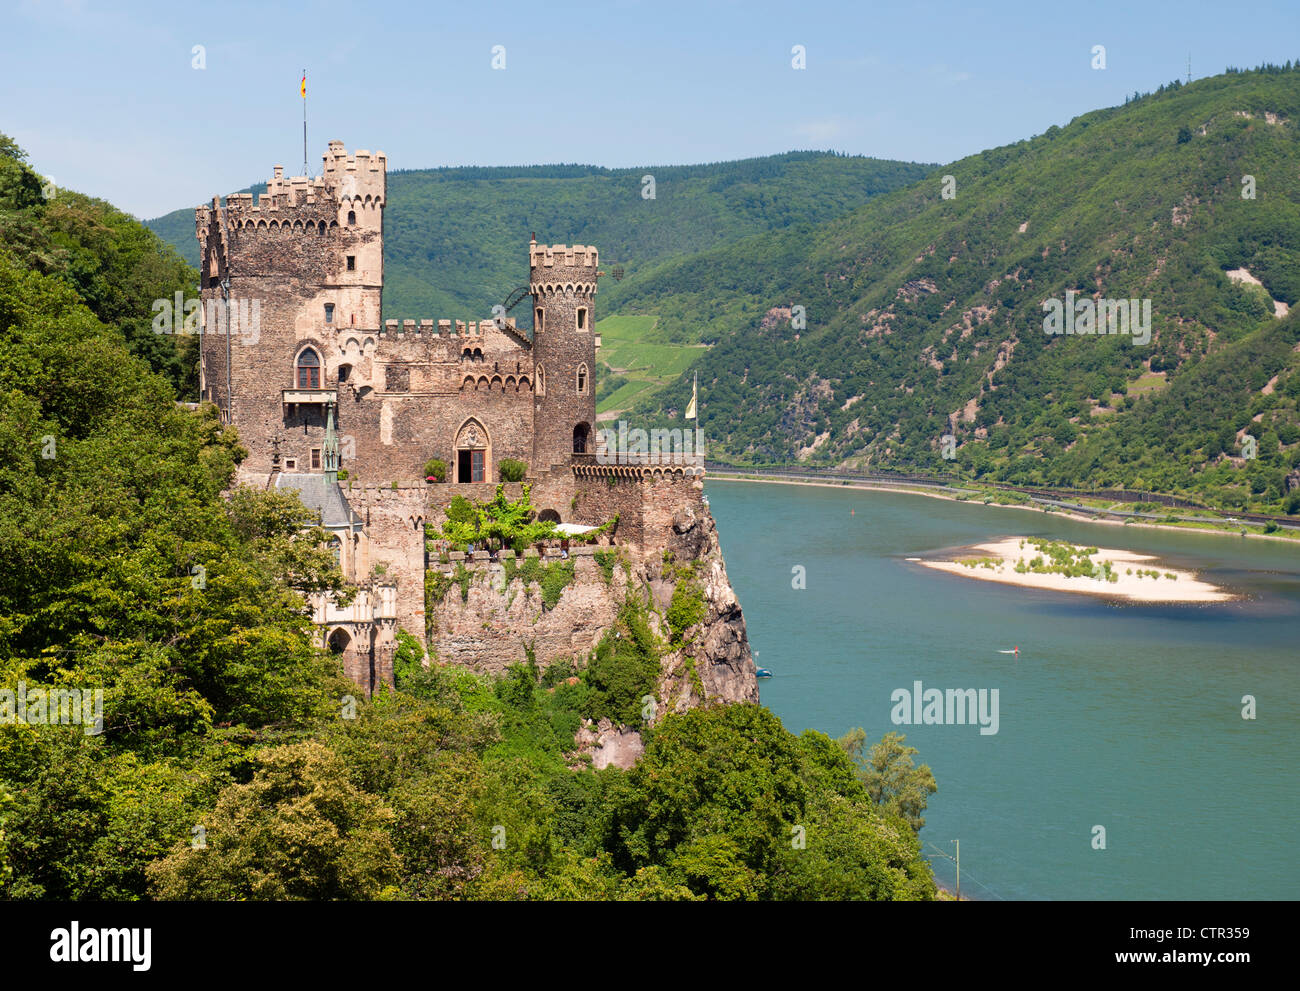 Burg Rheinstein castle above river Rhine in Germany - Stock Image